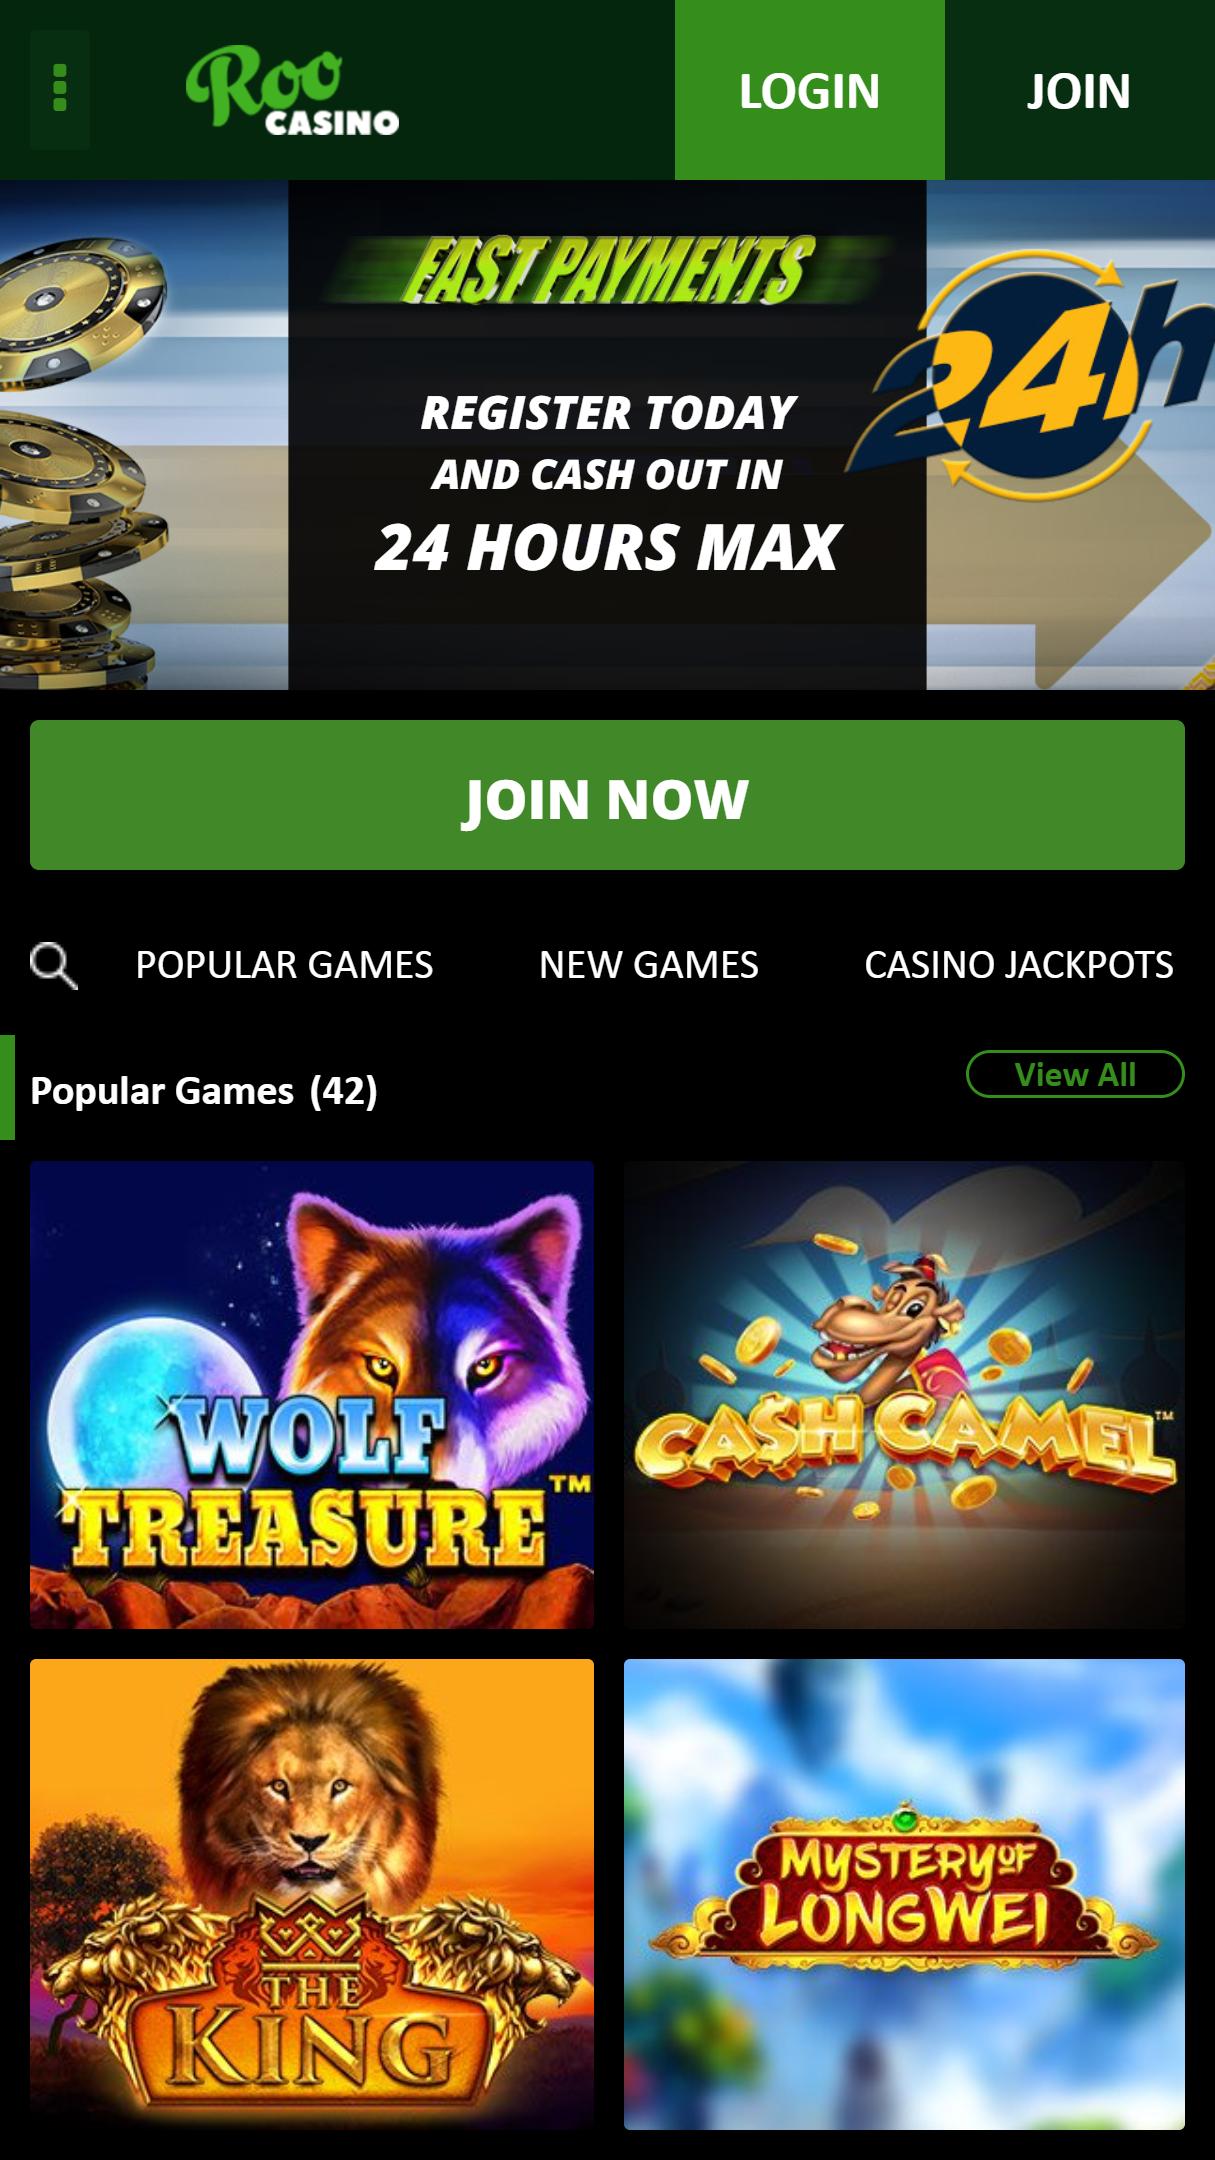 Roo Casino App Homepage